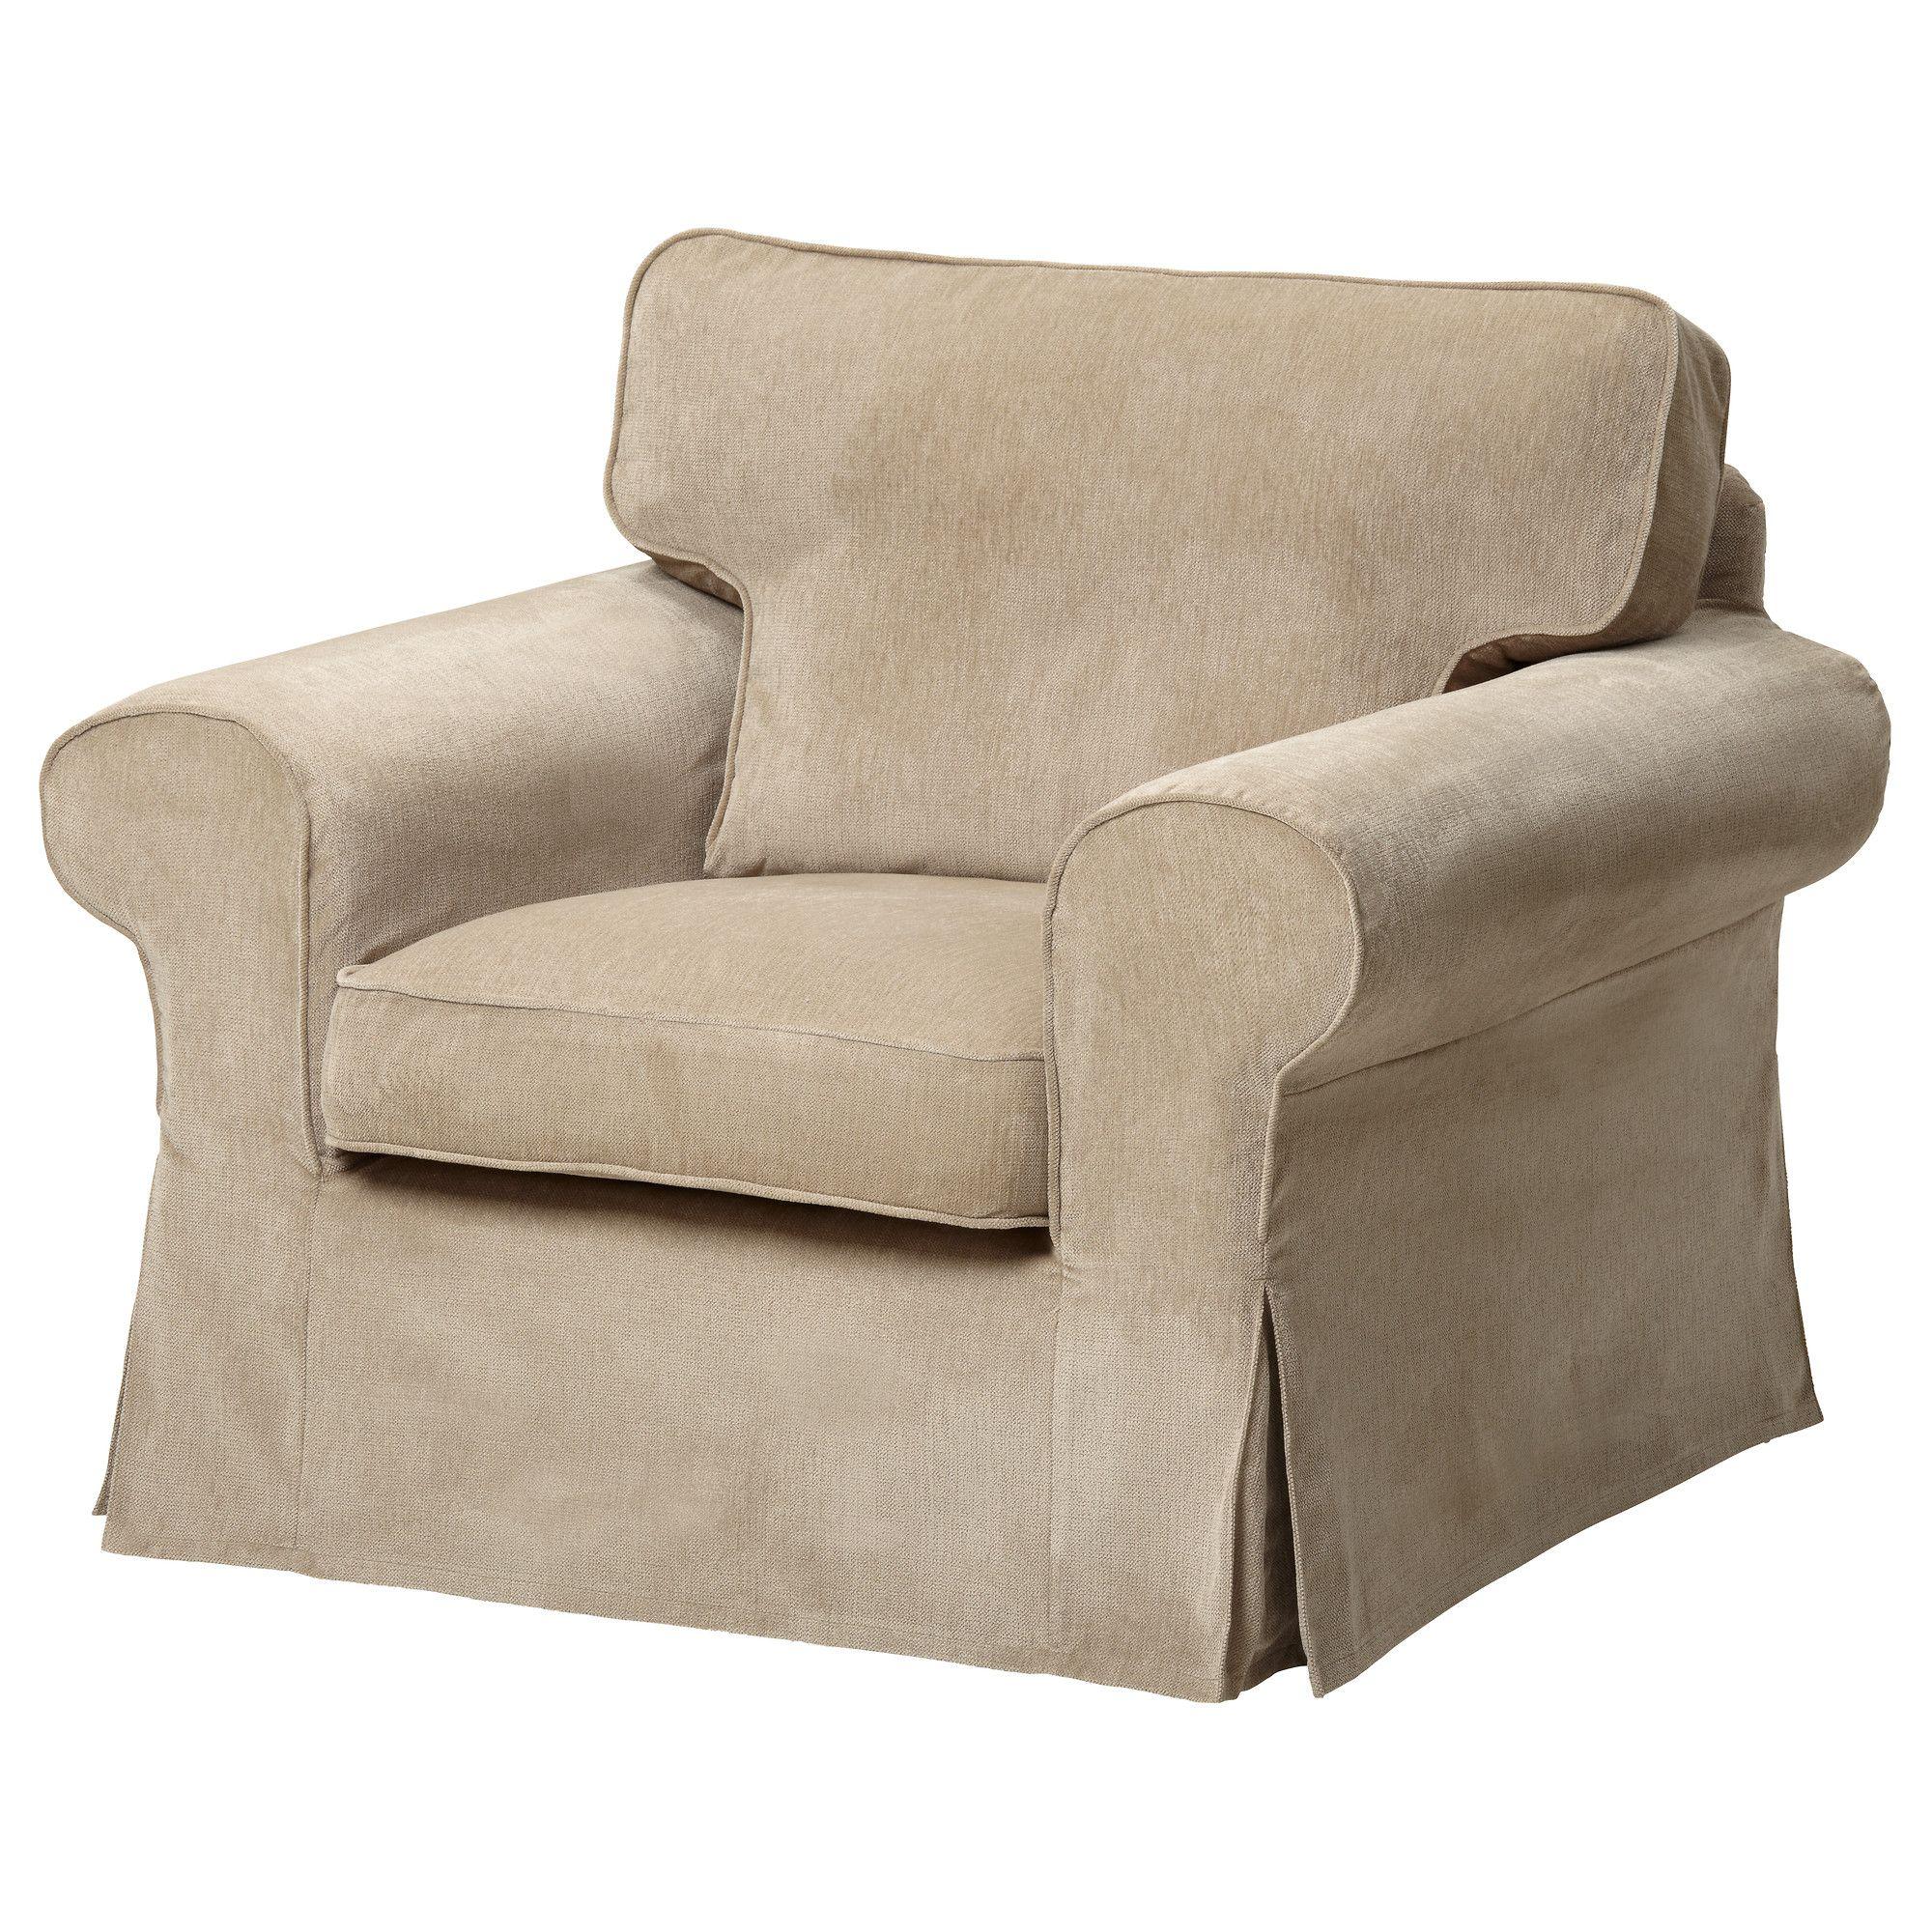 EKTORP Chair Norlida white beige IKEA household